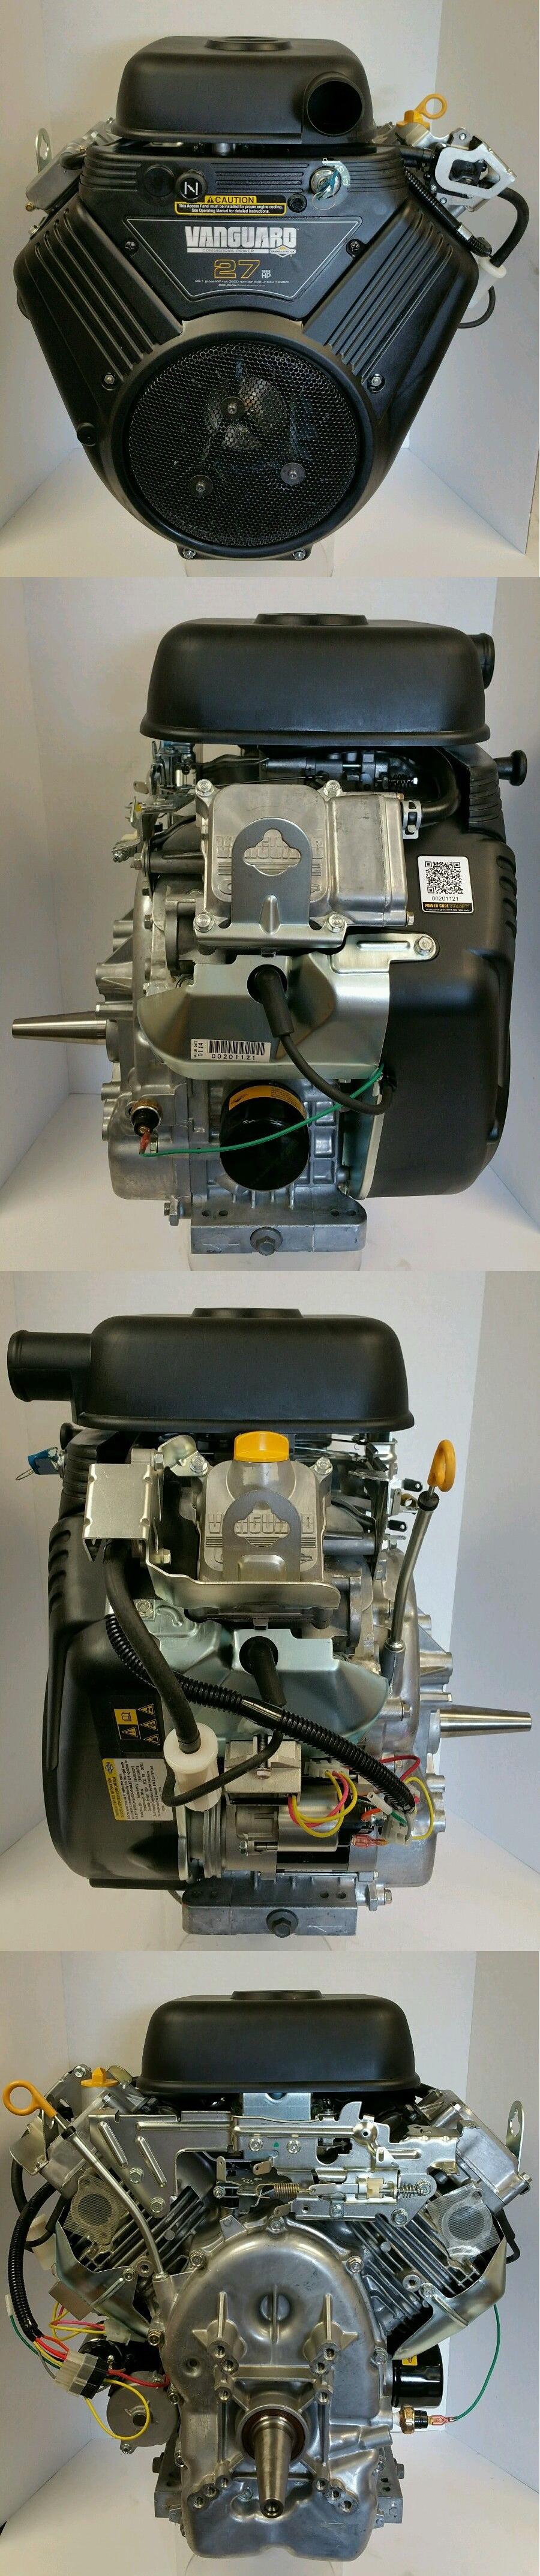 Engines Multi-Purpose 79670: 27Hp Briggs And Stratton Vanguard